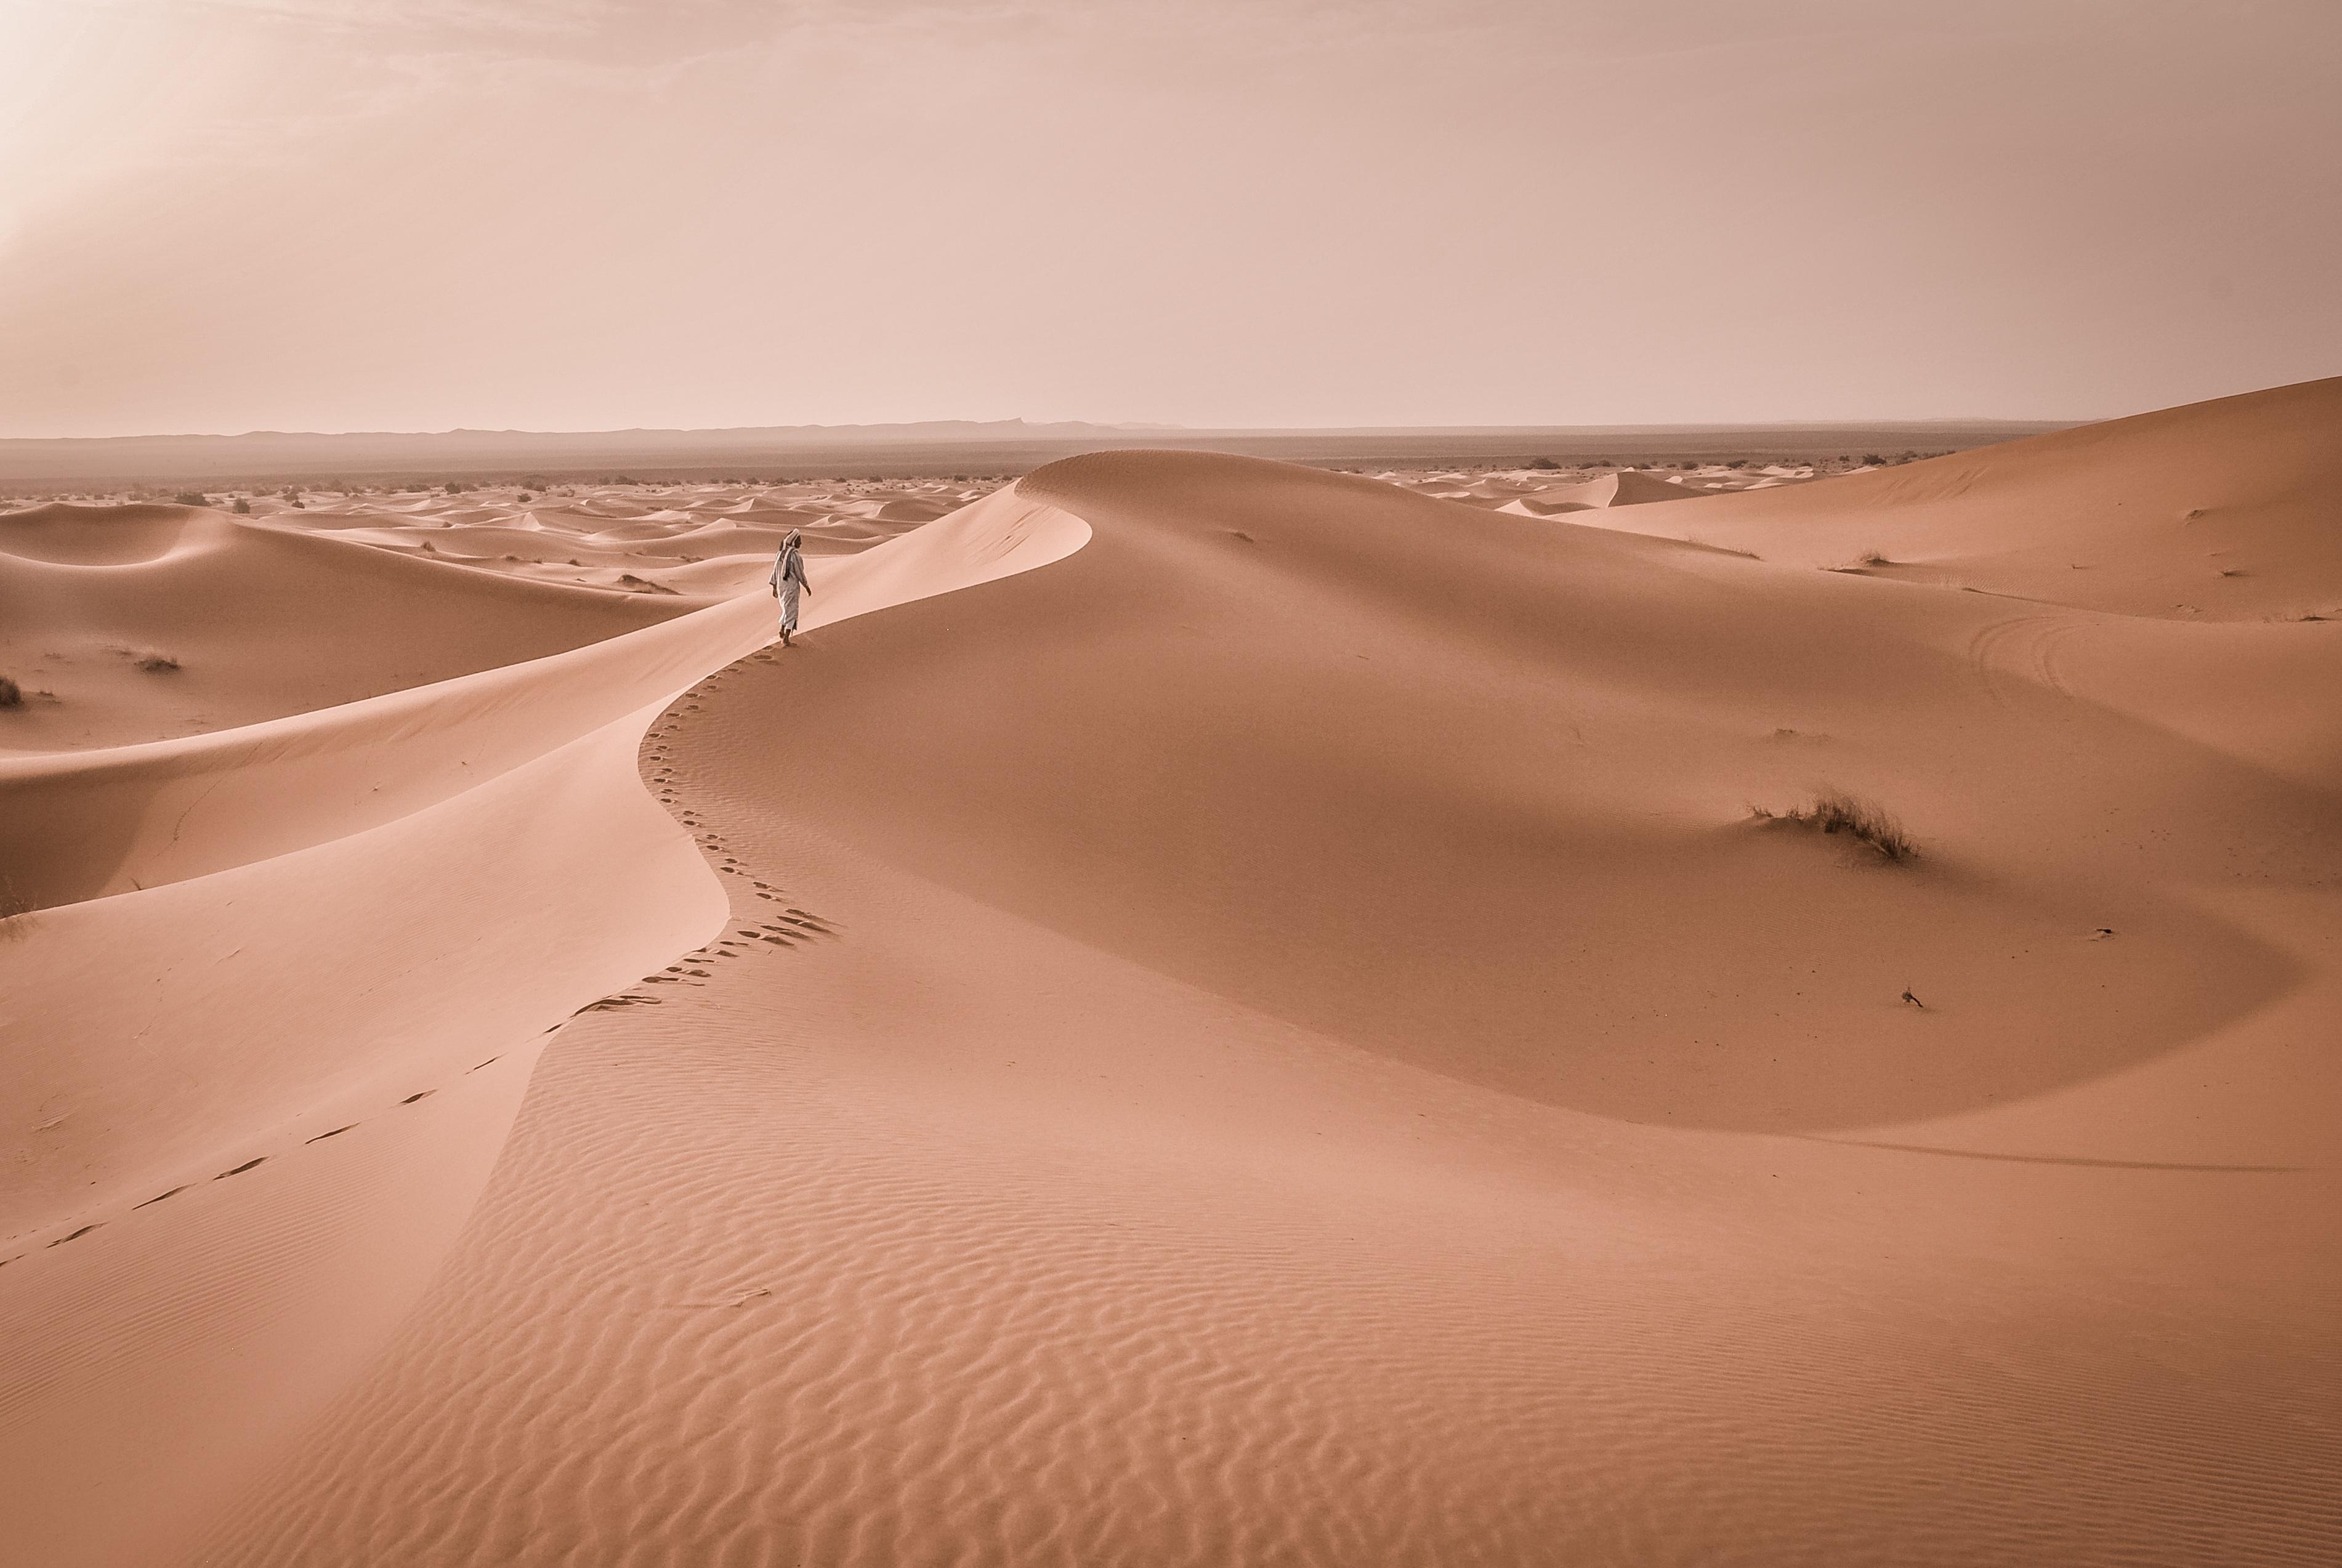 steep sand dune pursued - HD3803×2546